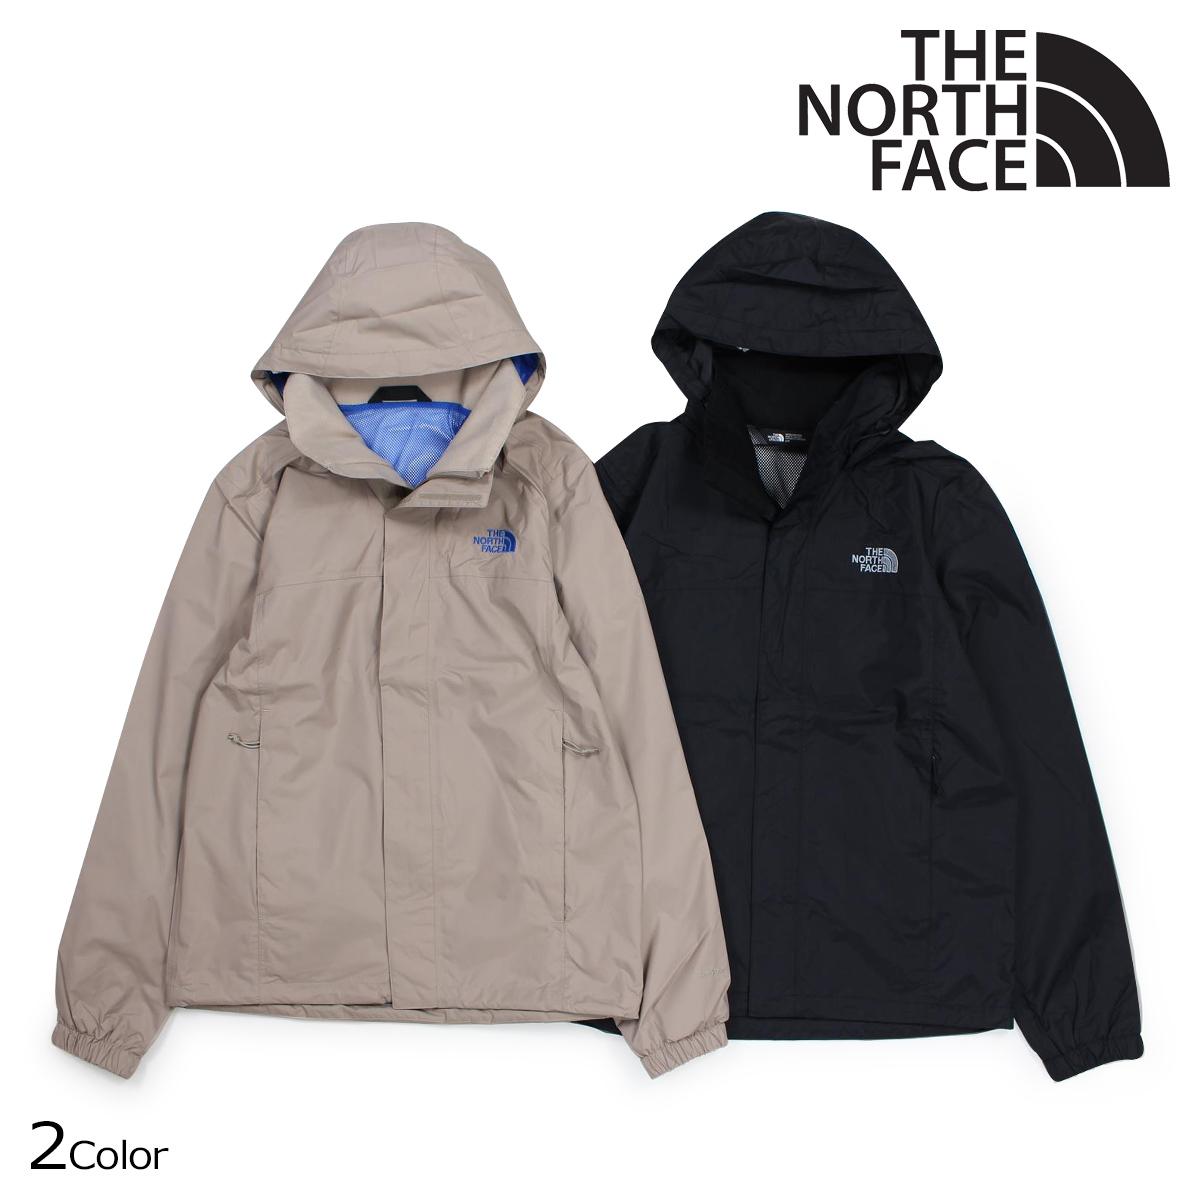 The North Face Resolve 2 JACKET MEN